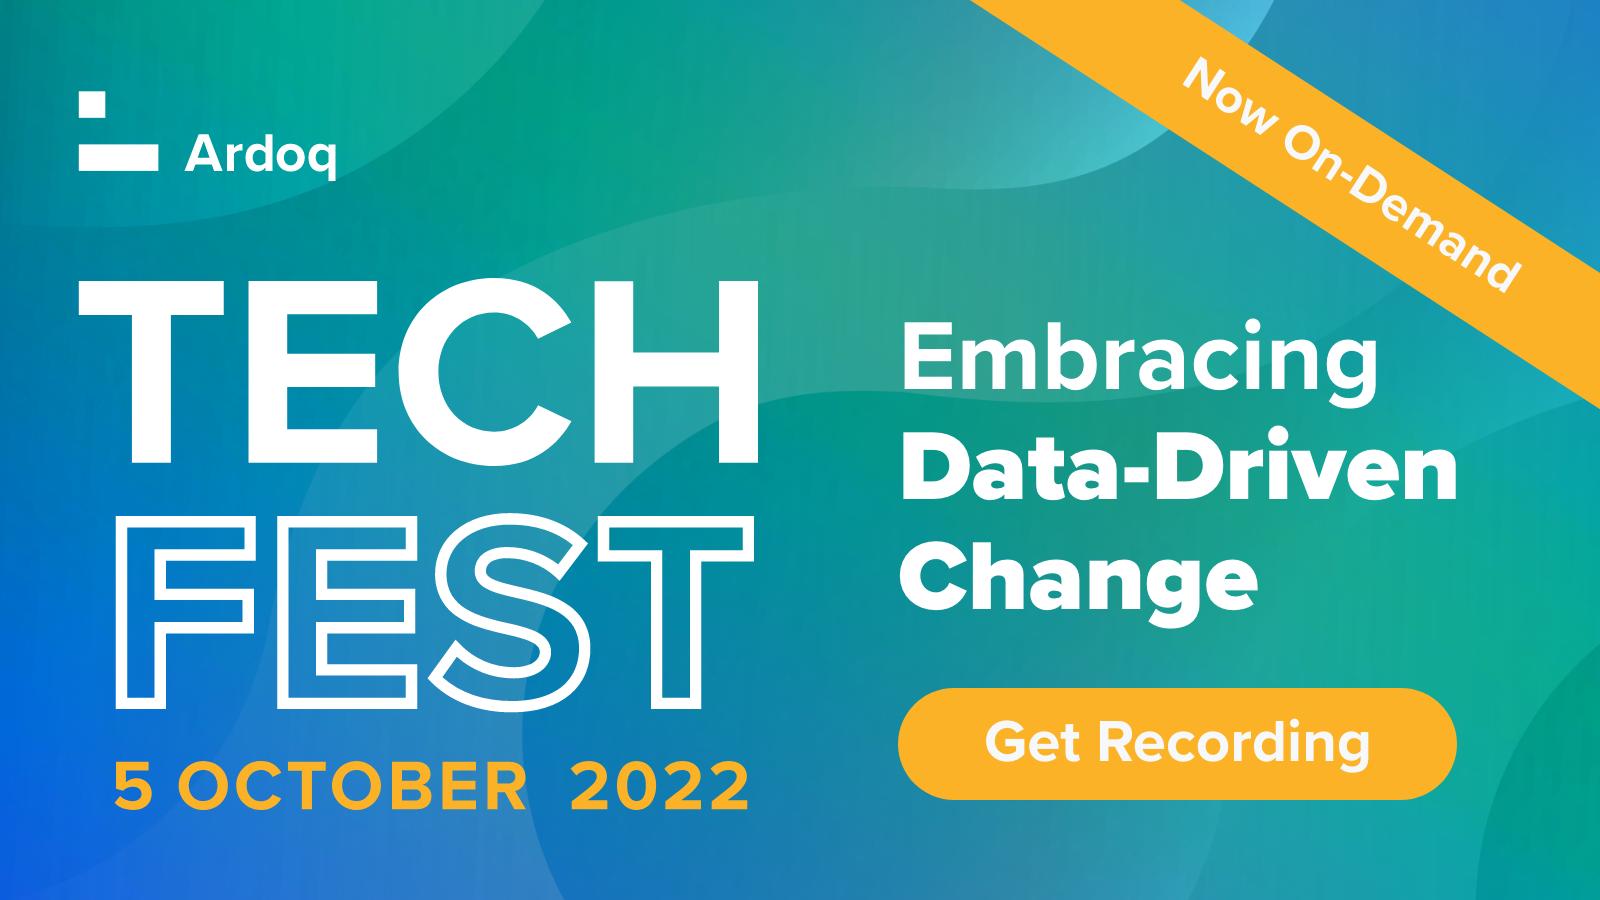 Ardoq Tech Fest 2021 Embracing Data-Driven Change